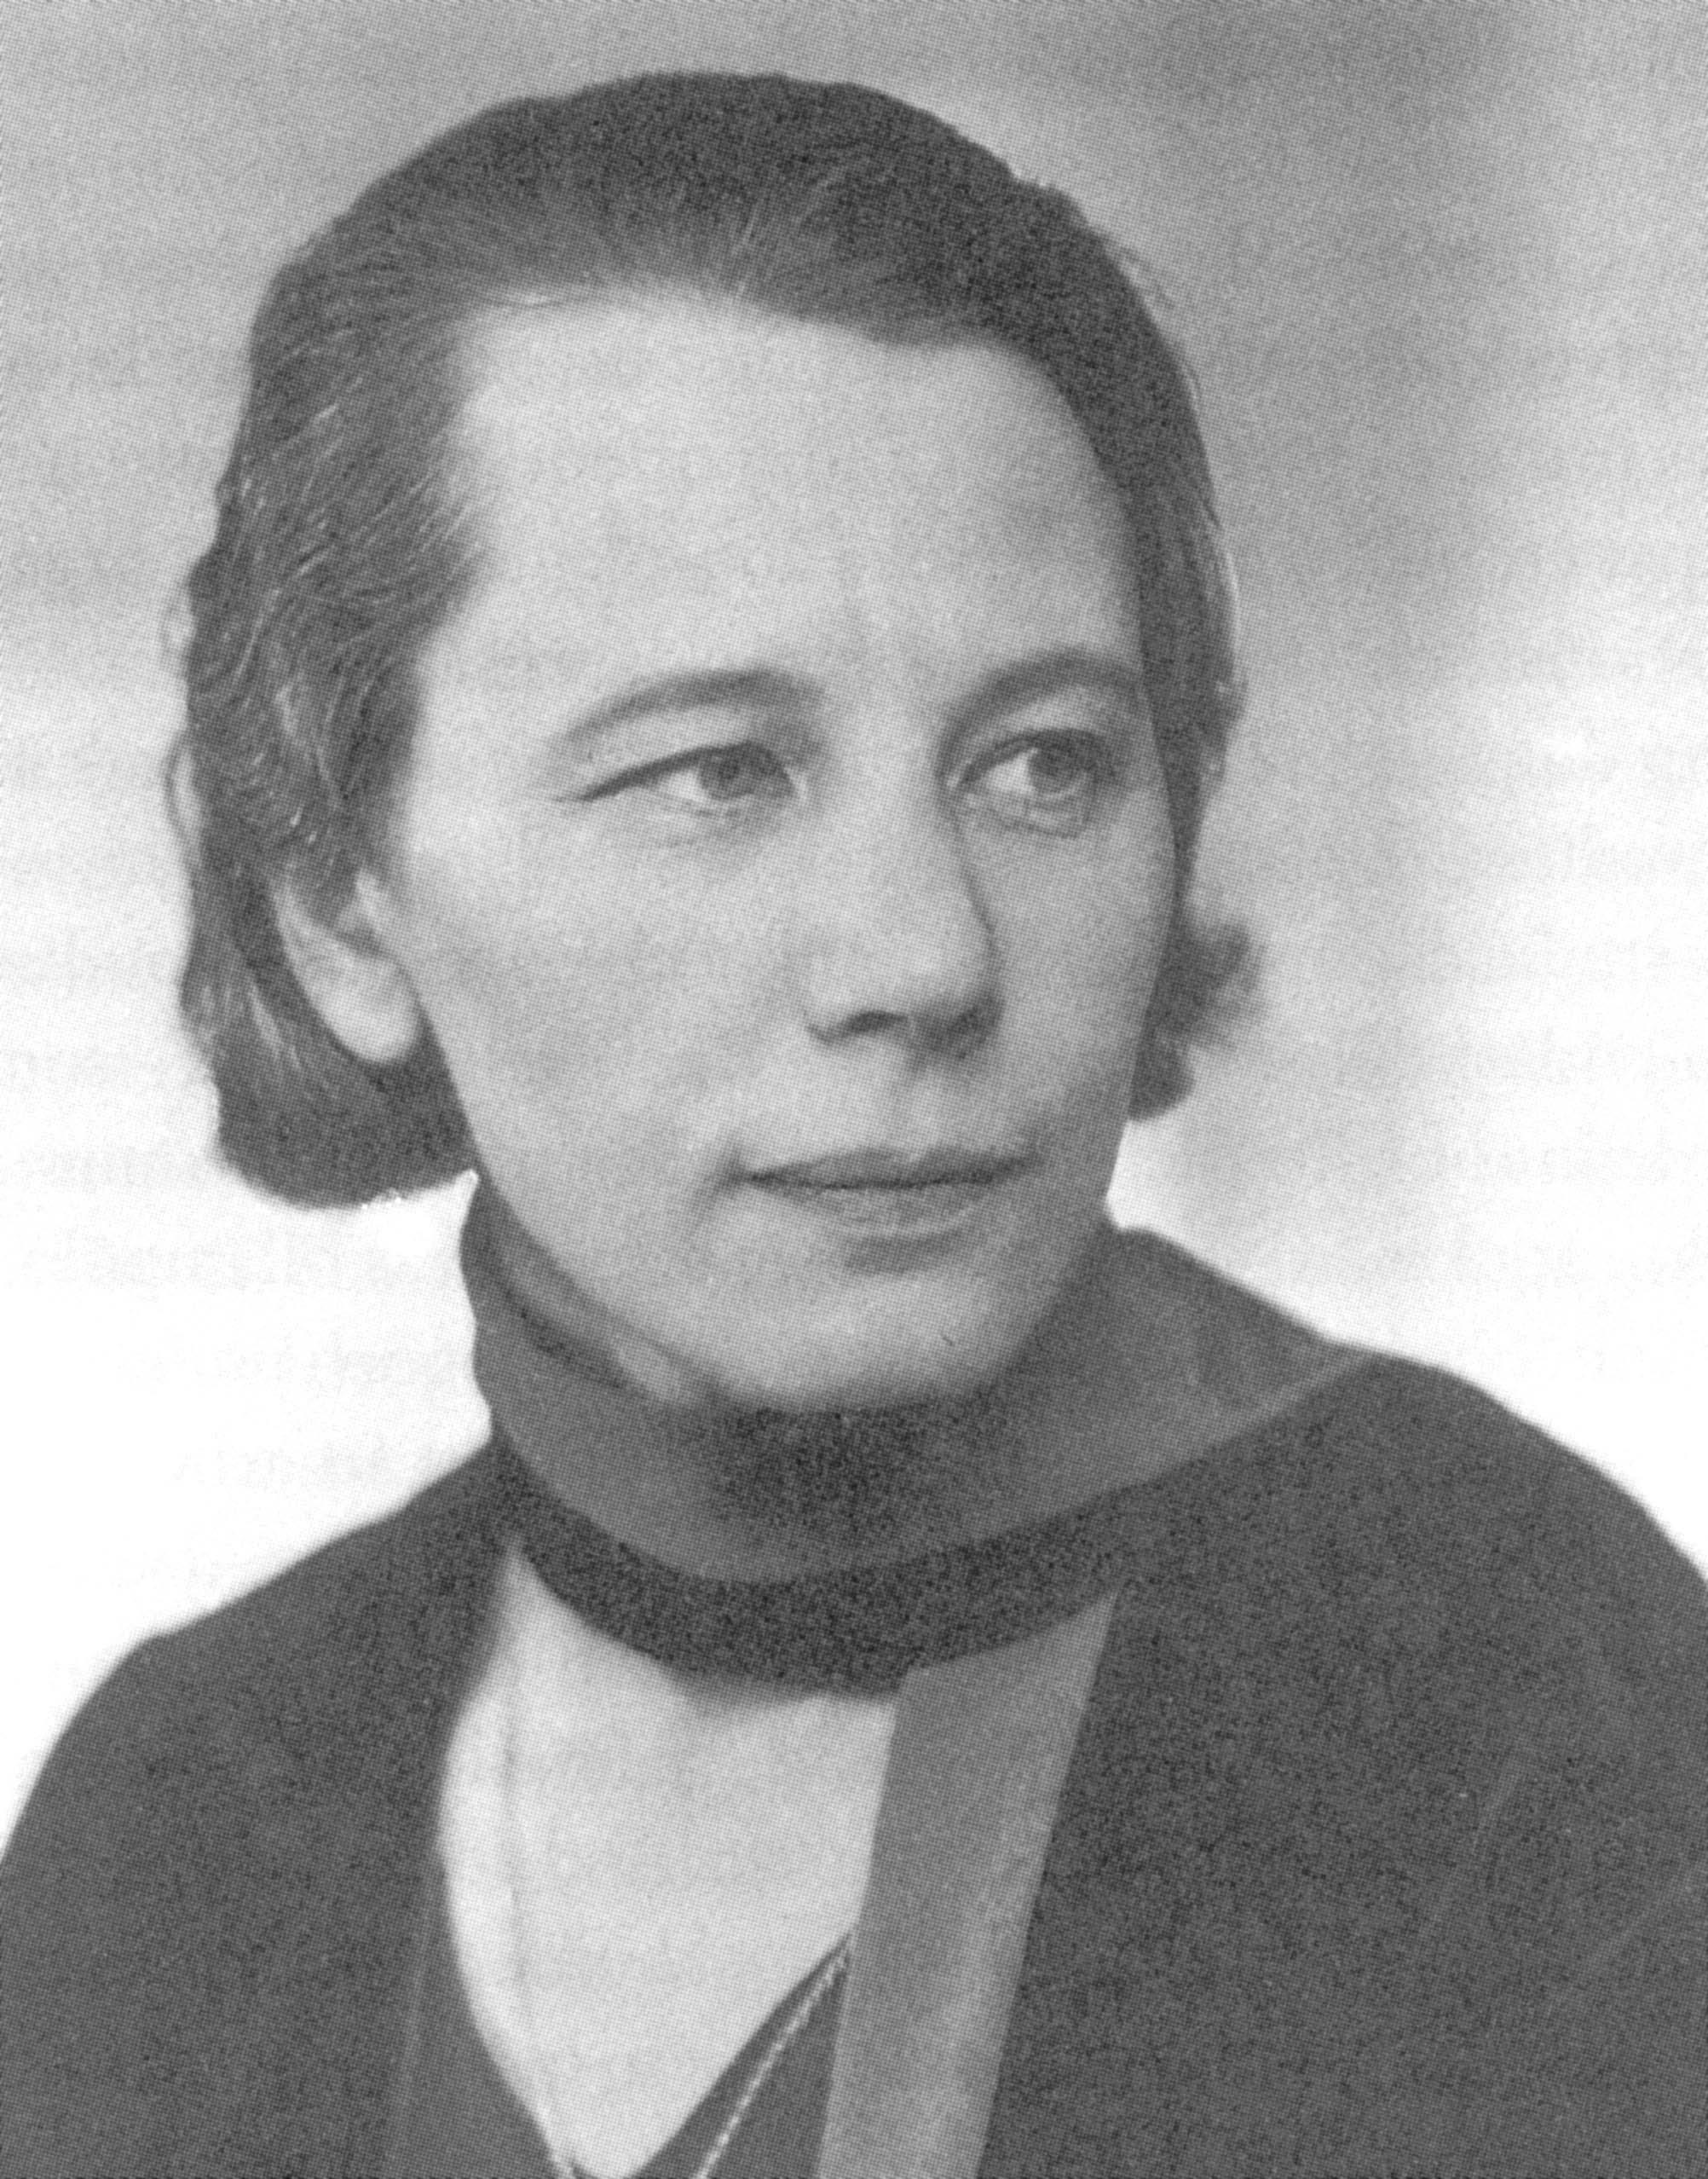 Karin Kock (KvinnSam, Göteborgs universitetsbibliotek)